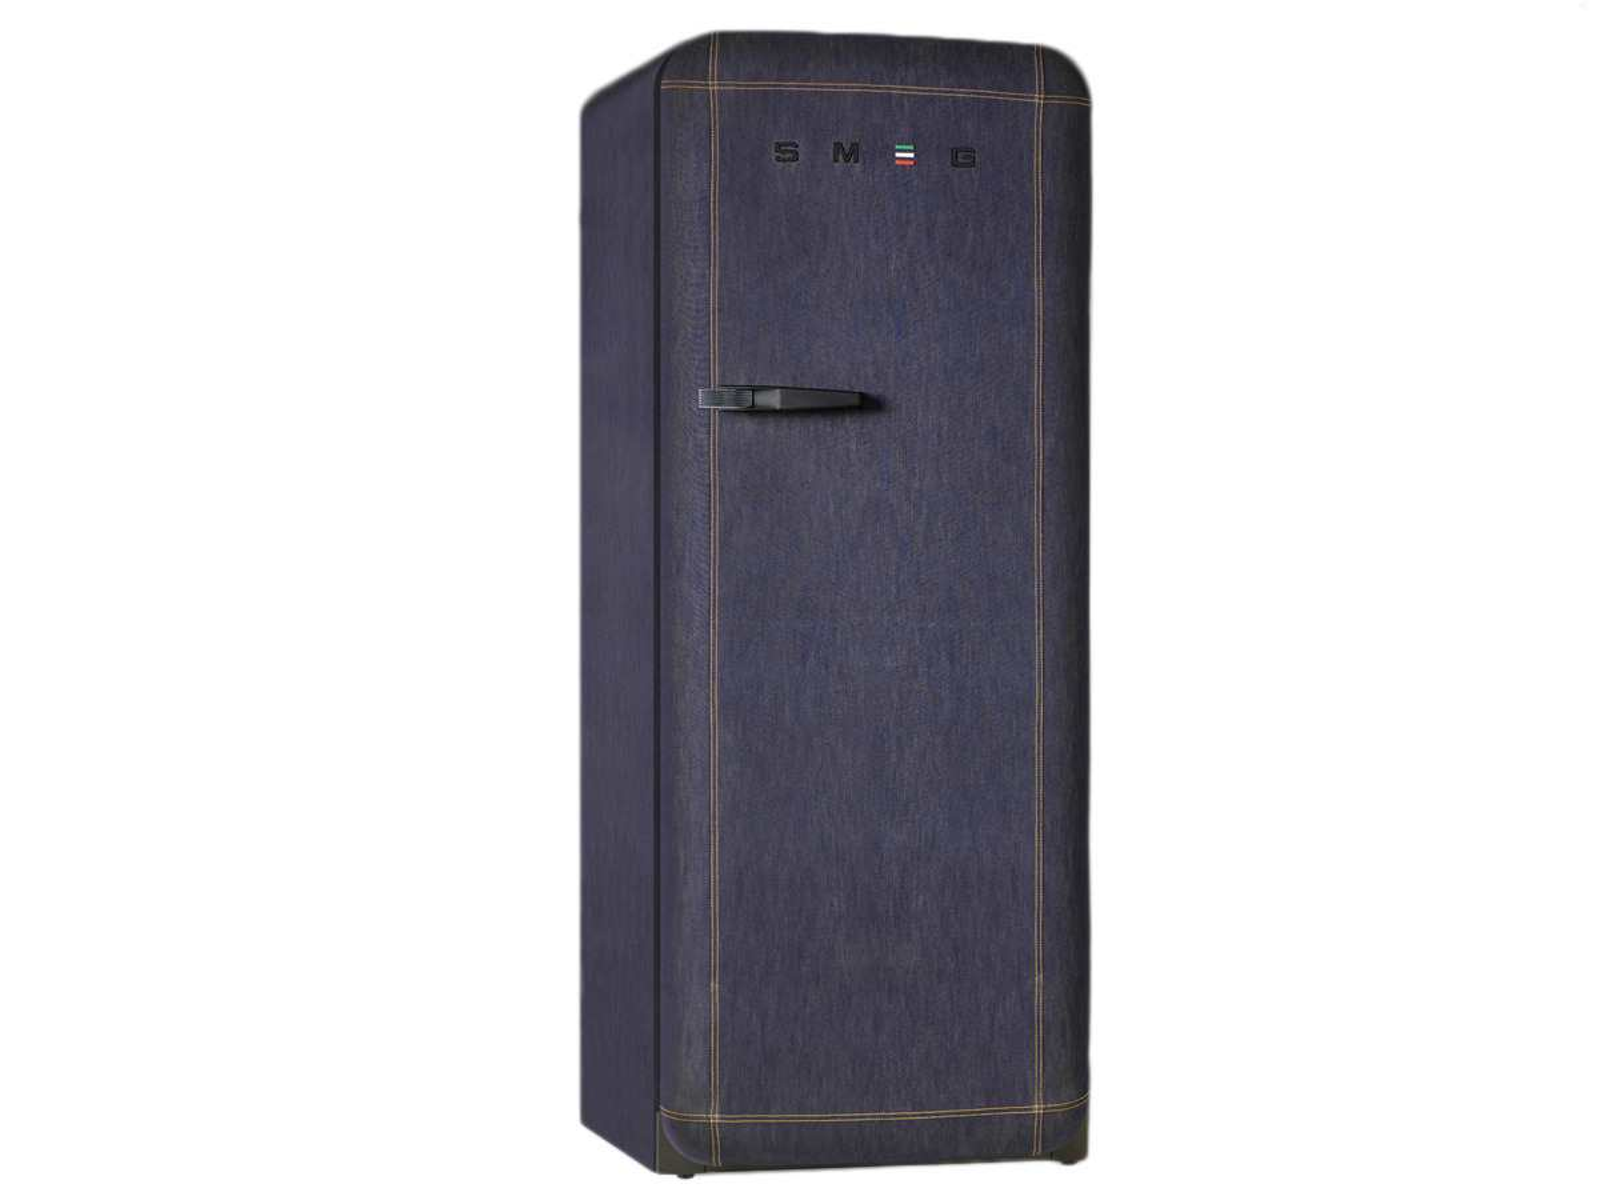 Smeg Kühlschrank Groß : Smeg kühlschrank wollenberg wohnen